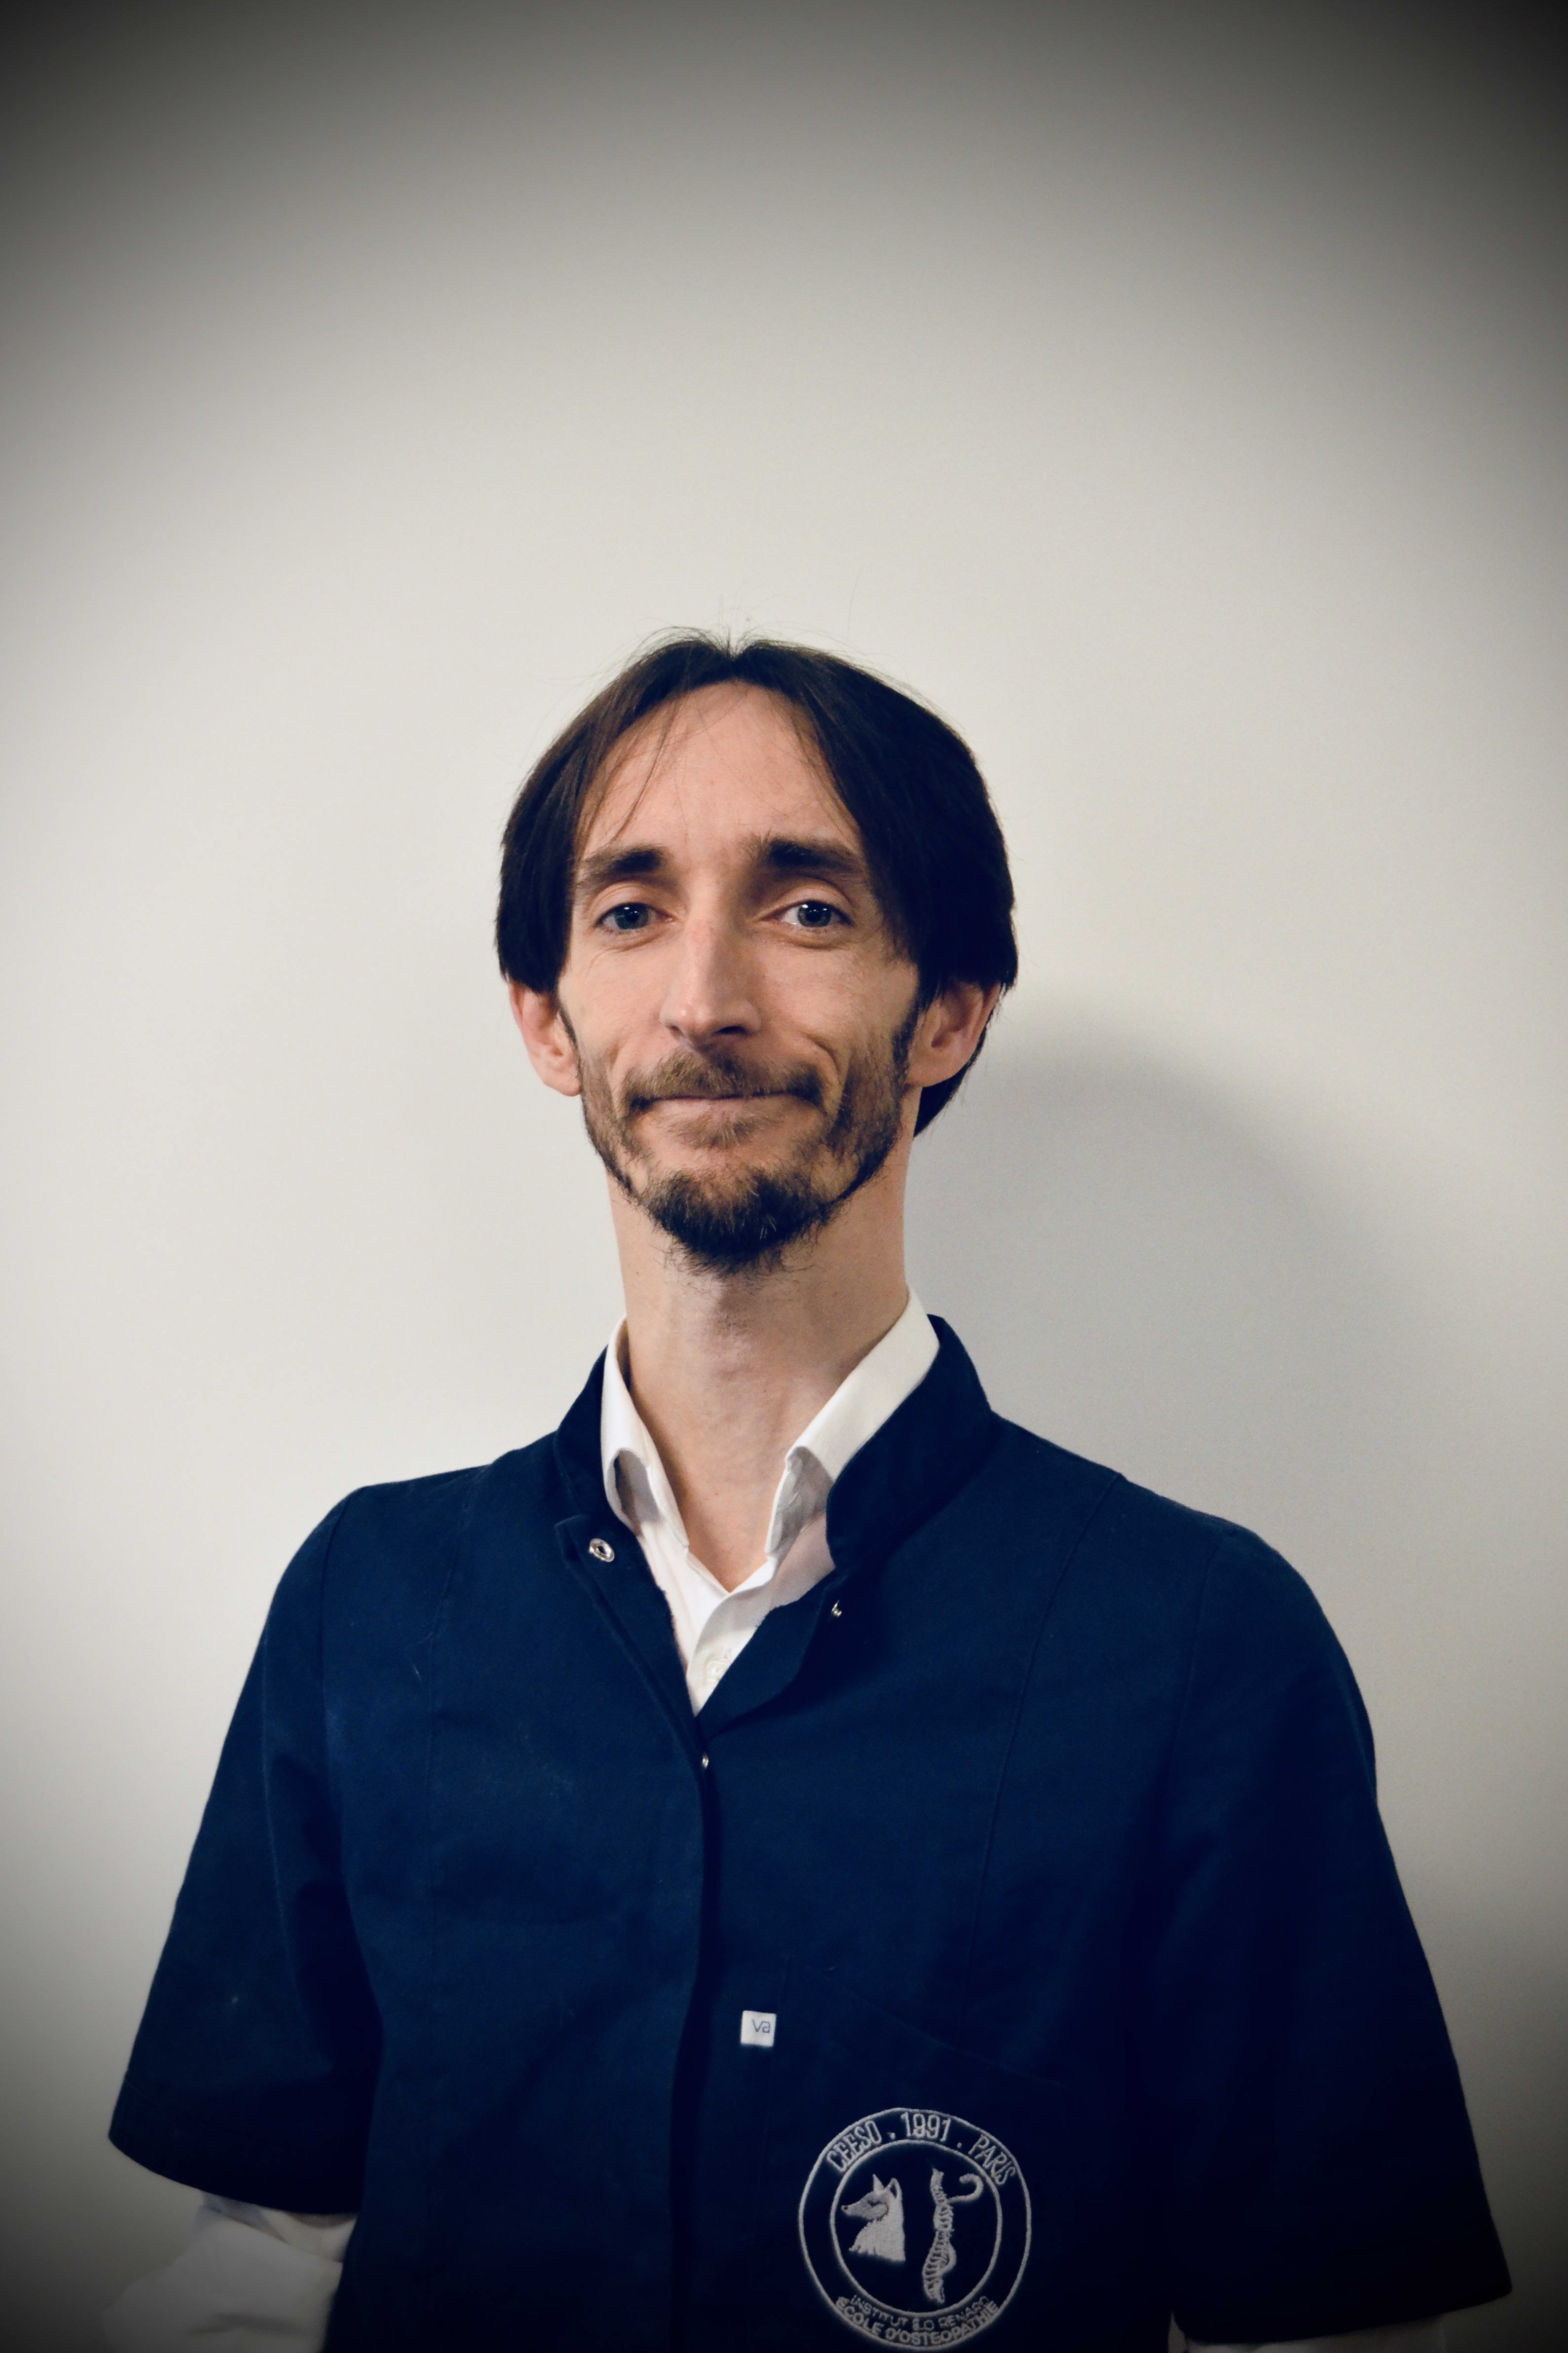 FrançoisReliant